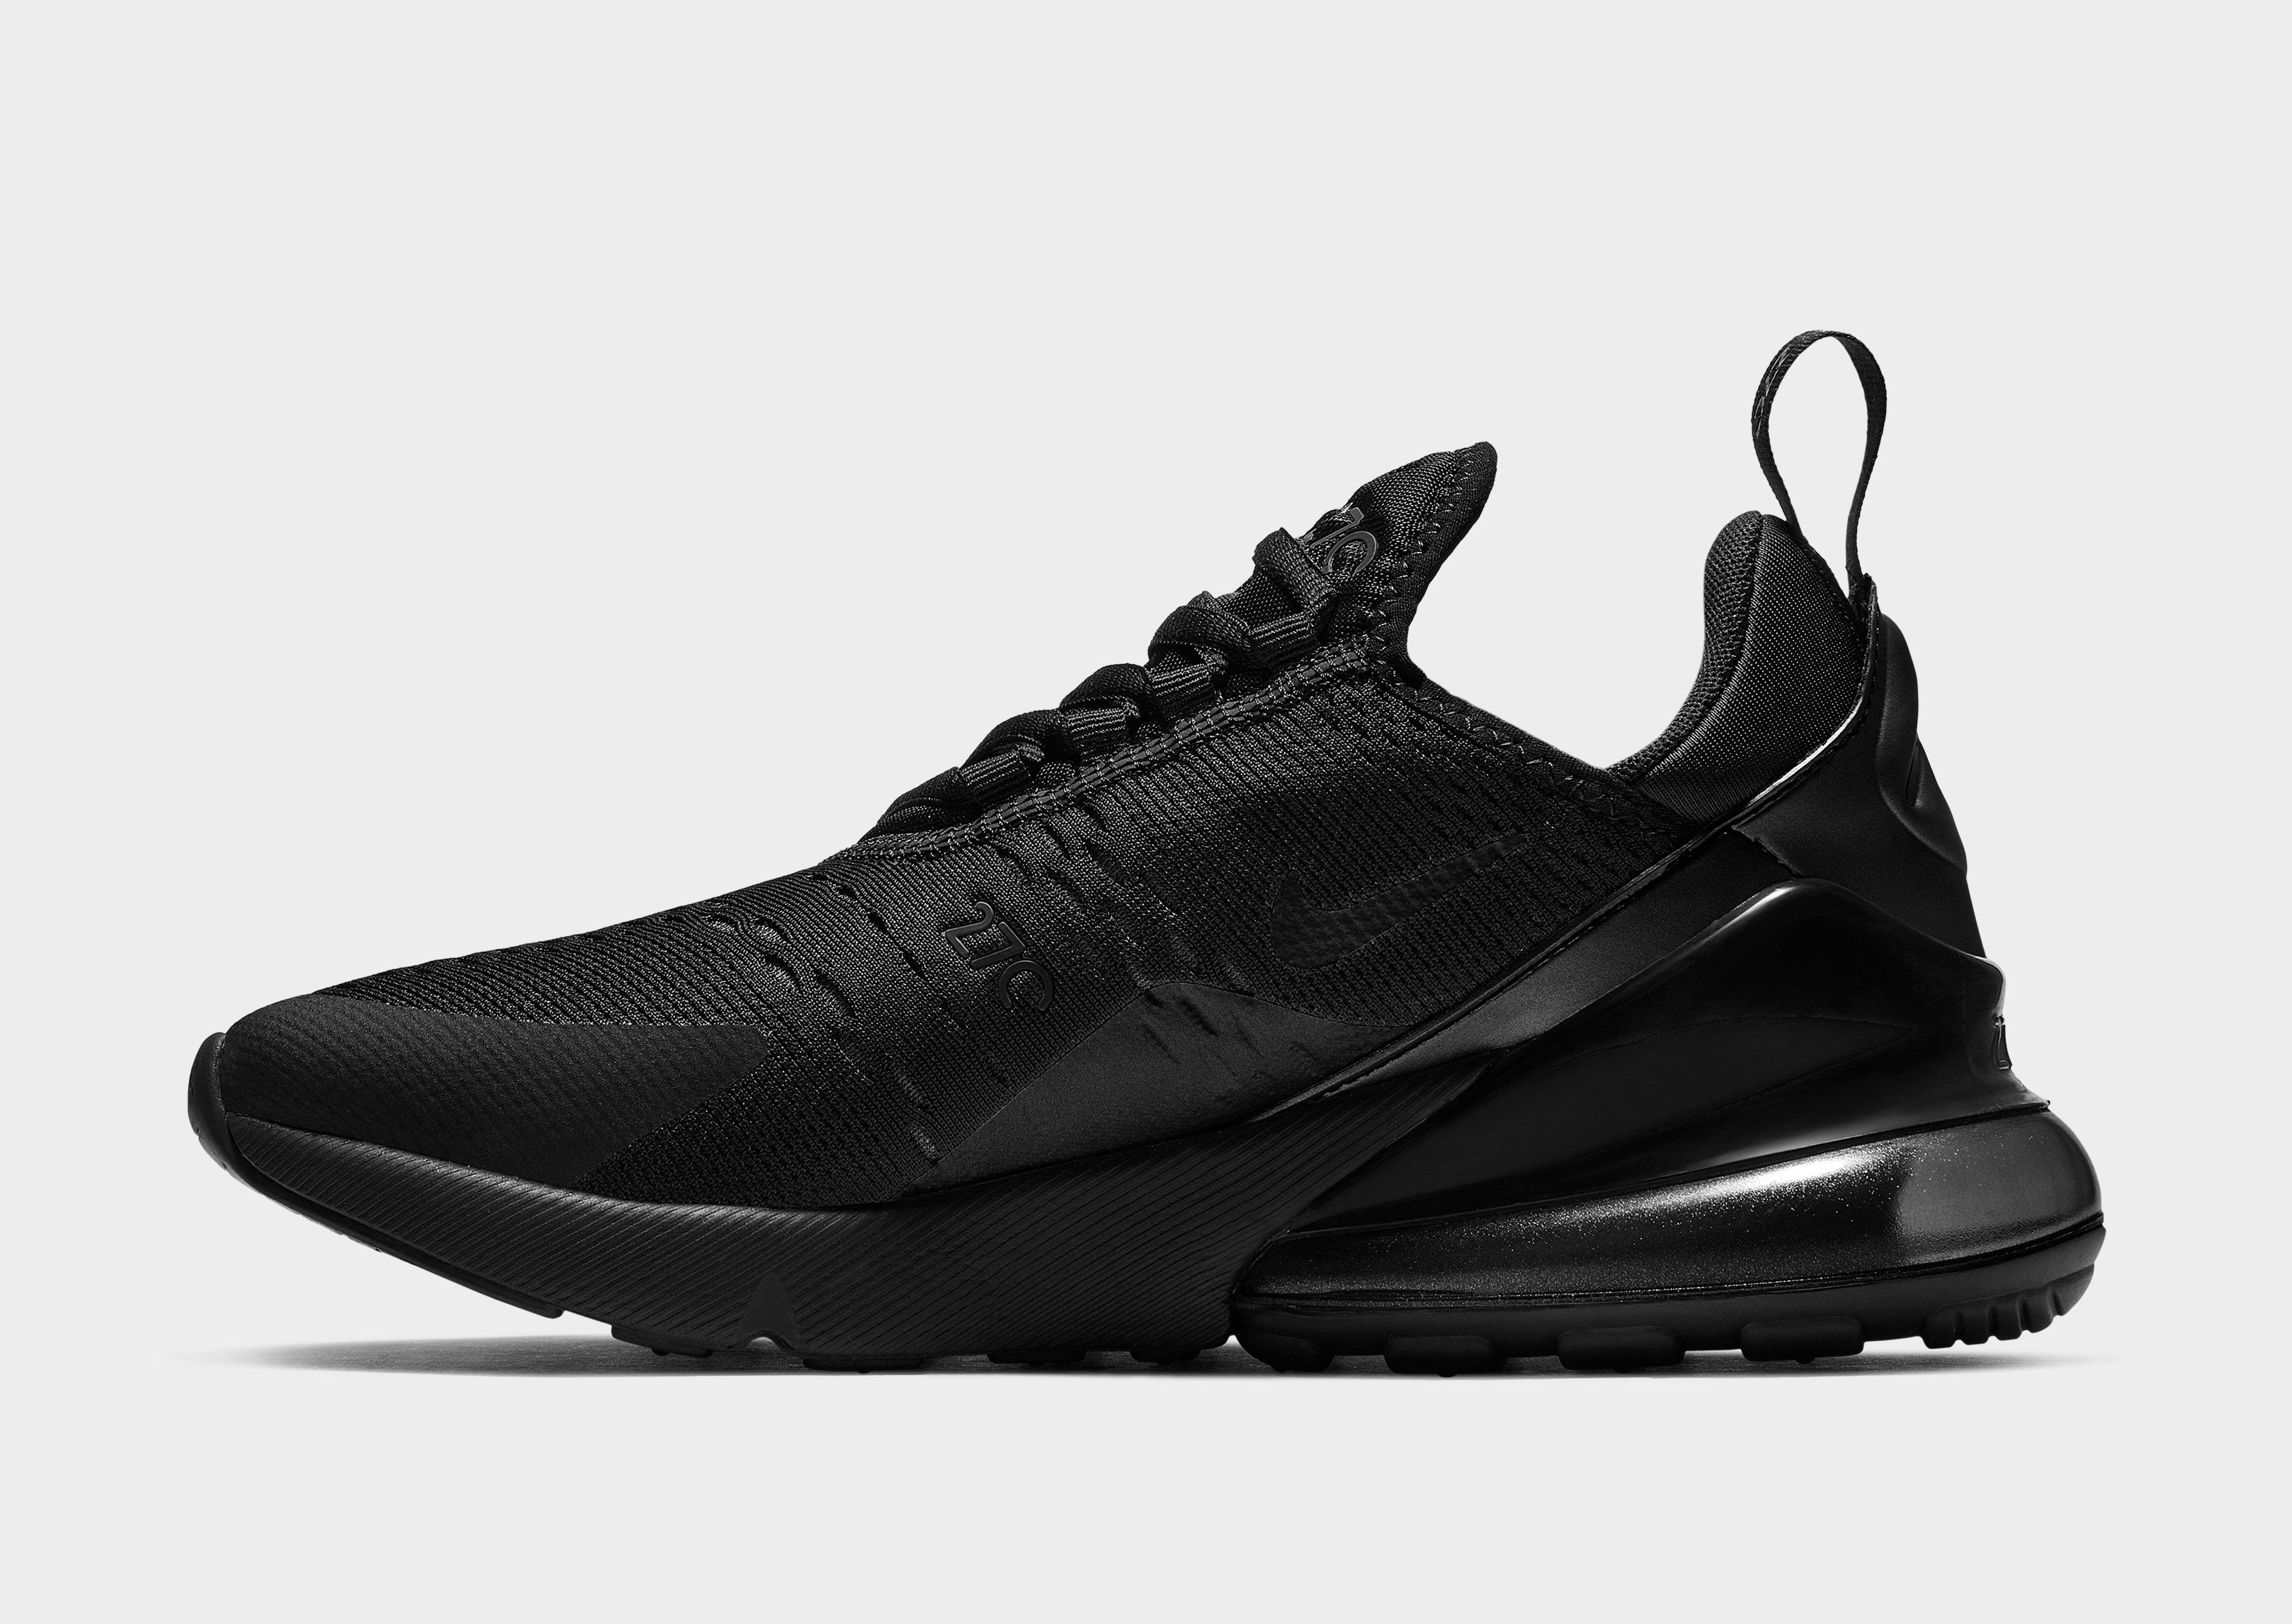 premium selection 8c03b 3dc45 Nike Air Max 270 Women's Shoe | JD Sports